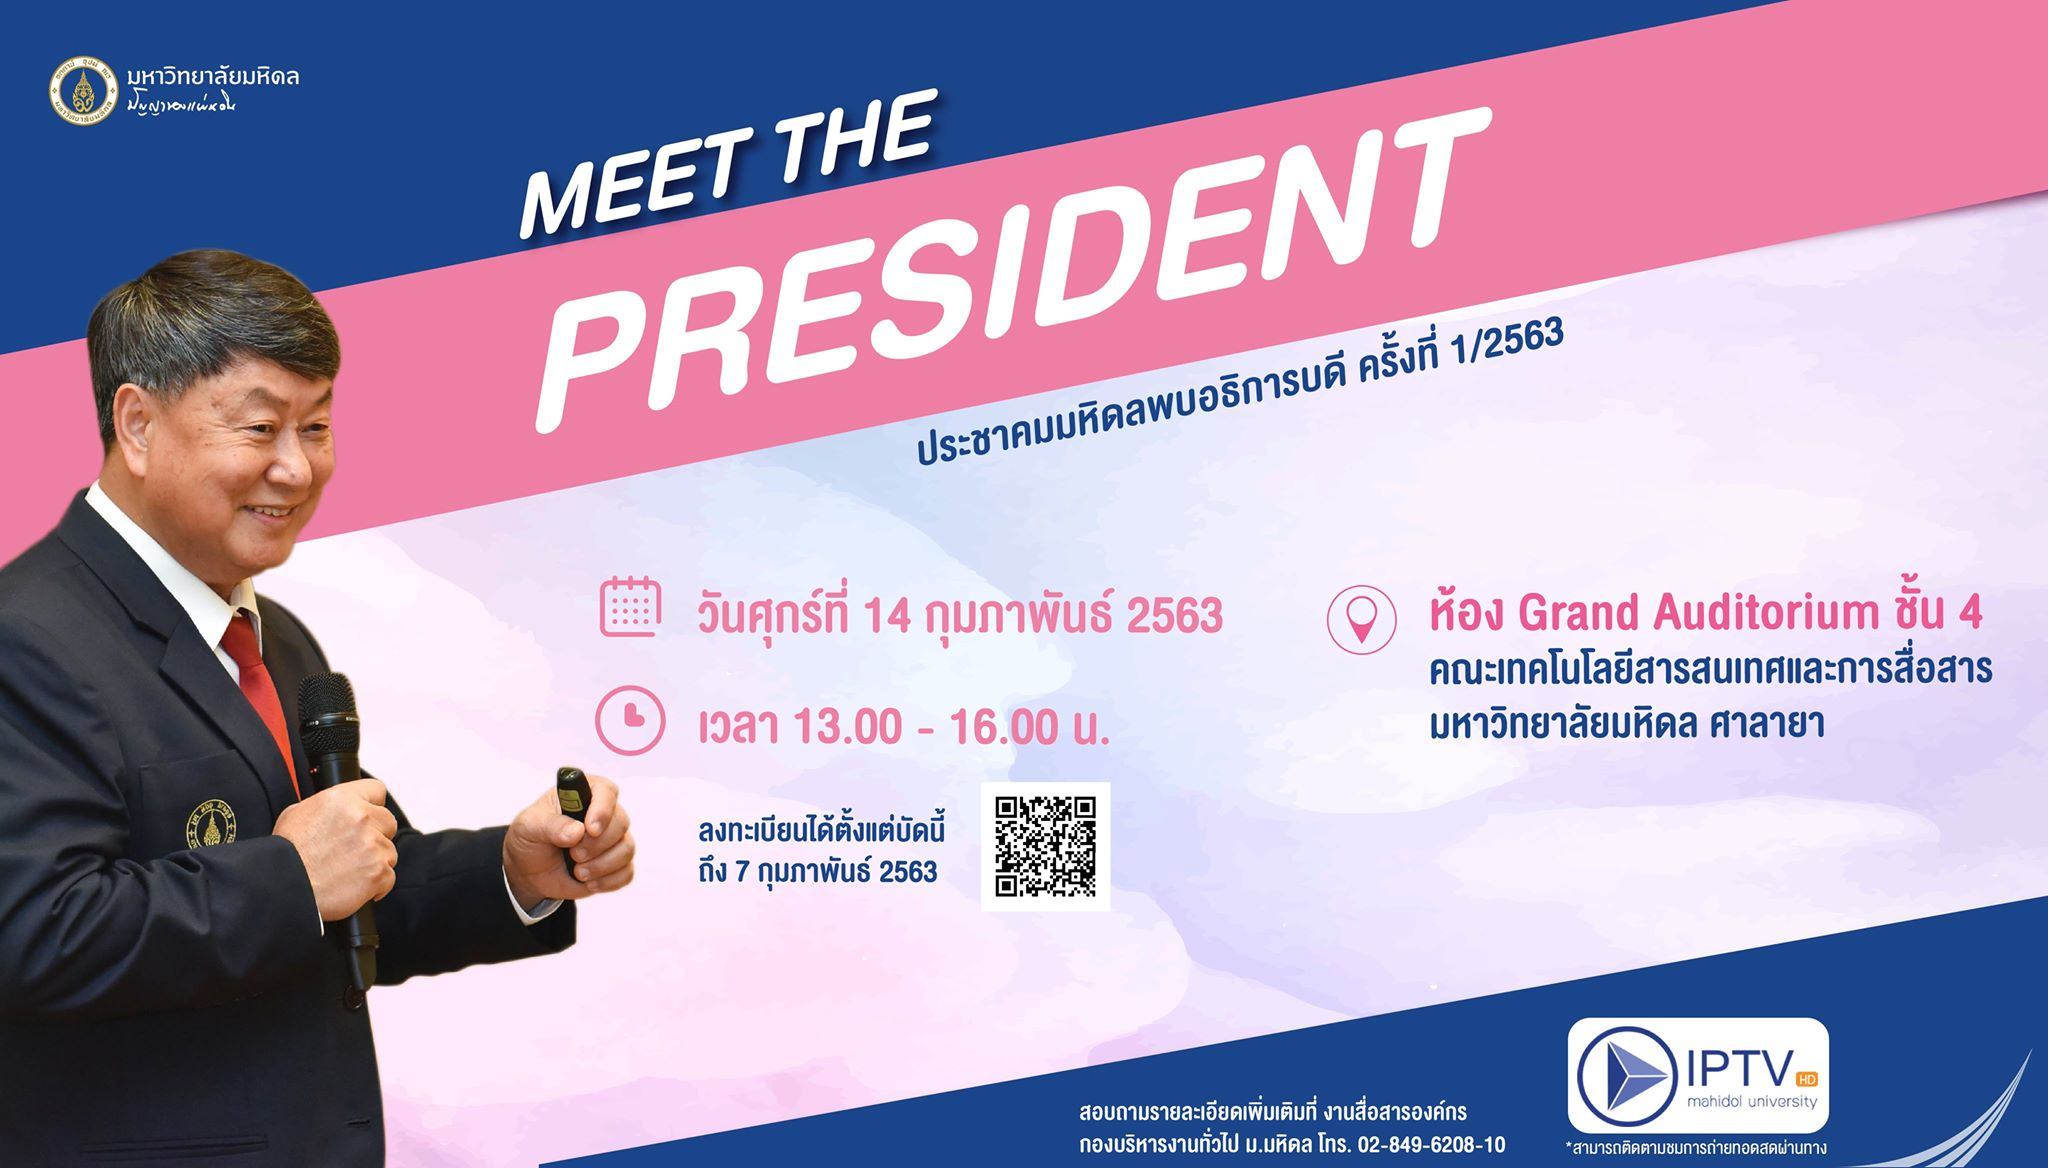 Meet the President ประชาคมมหิดลพบอธิการบดี 1/2563 @ คณะเทคโนโลยีสารสนเทศและการสื่อสาร